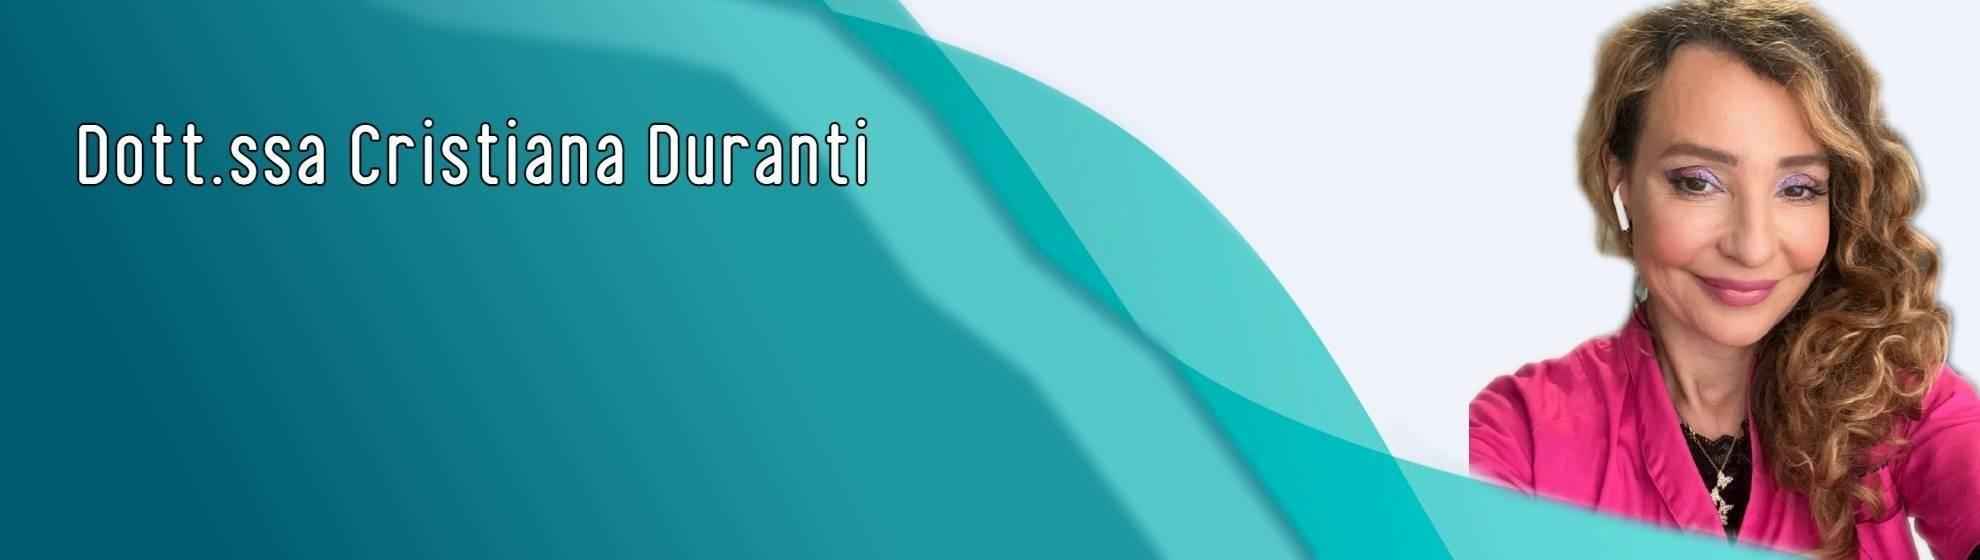 Dott.ssa Cristiana Duranti